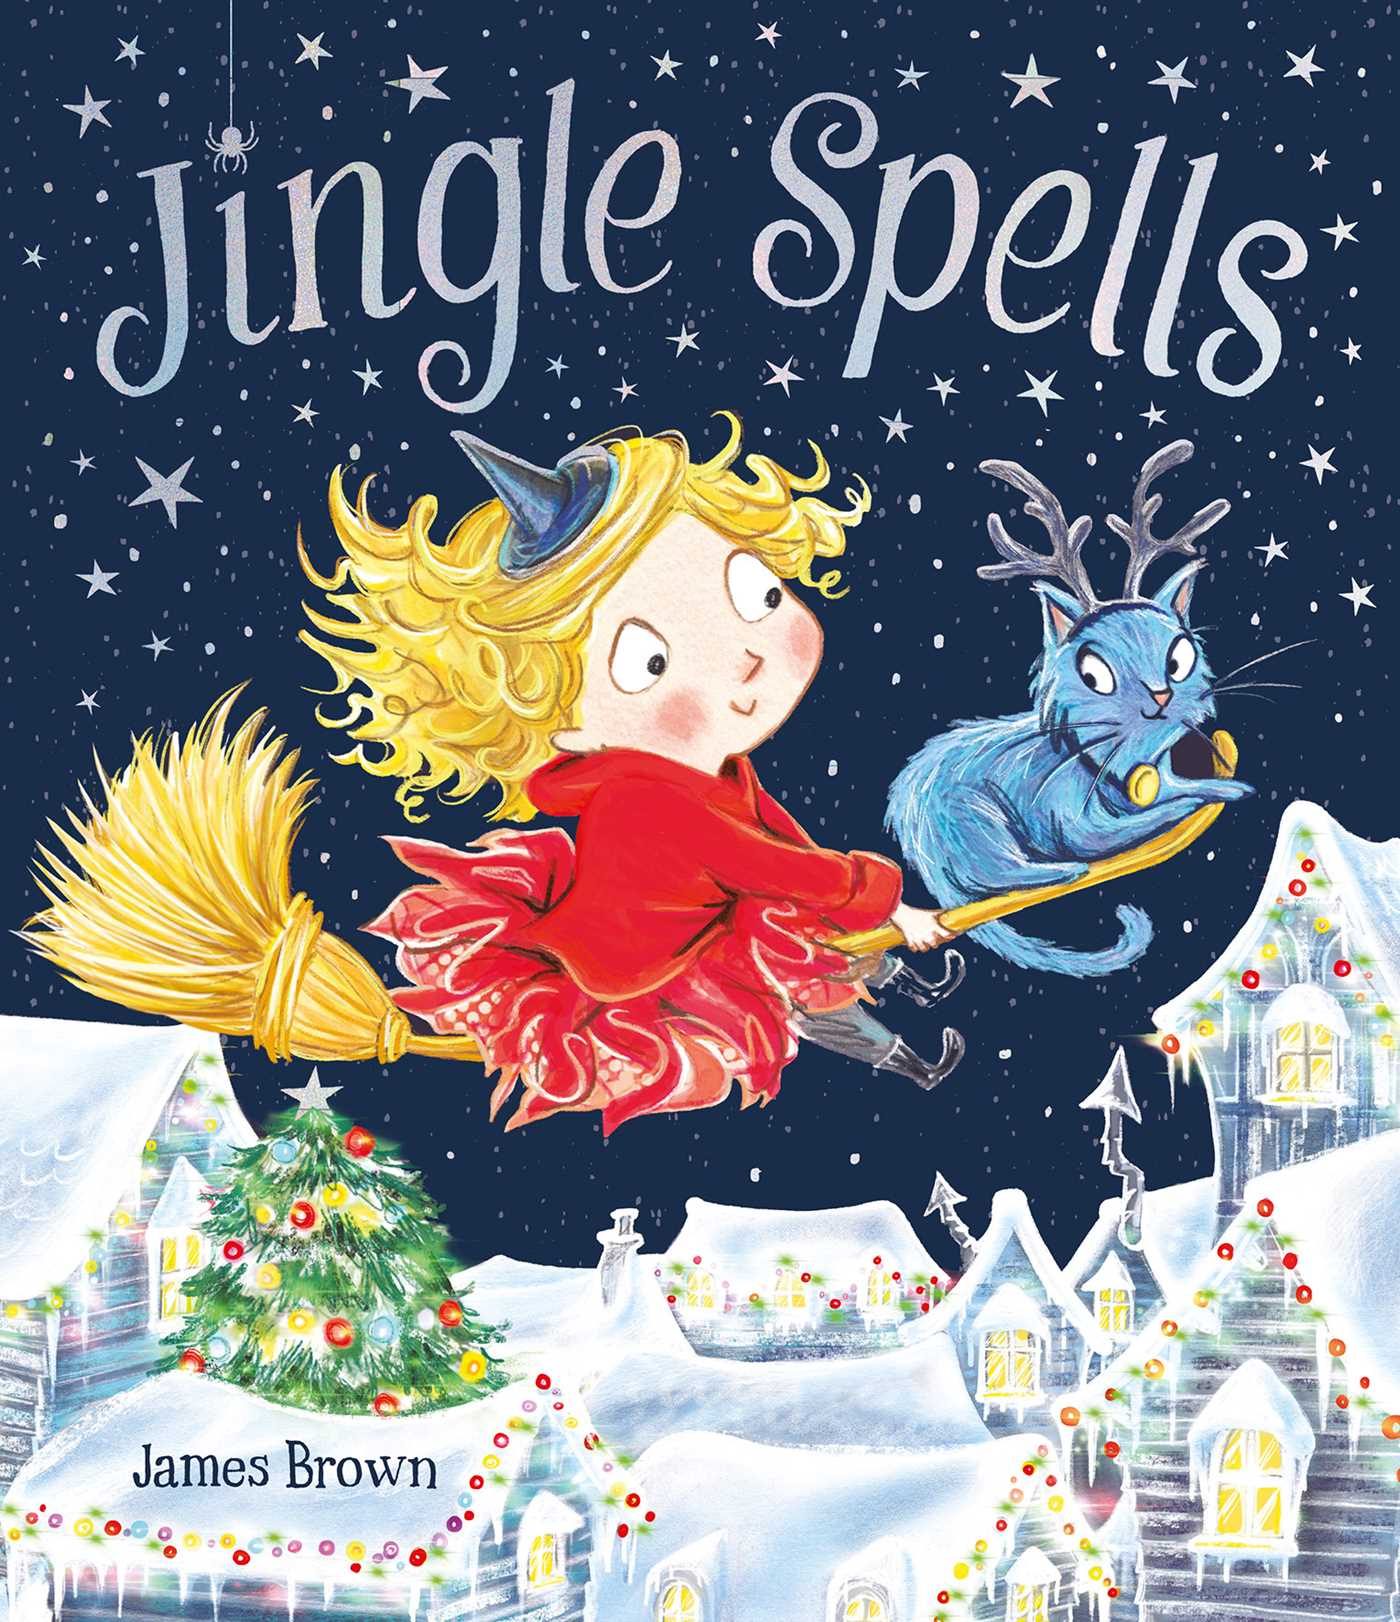 Image result for jingle spells james brown image